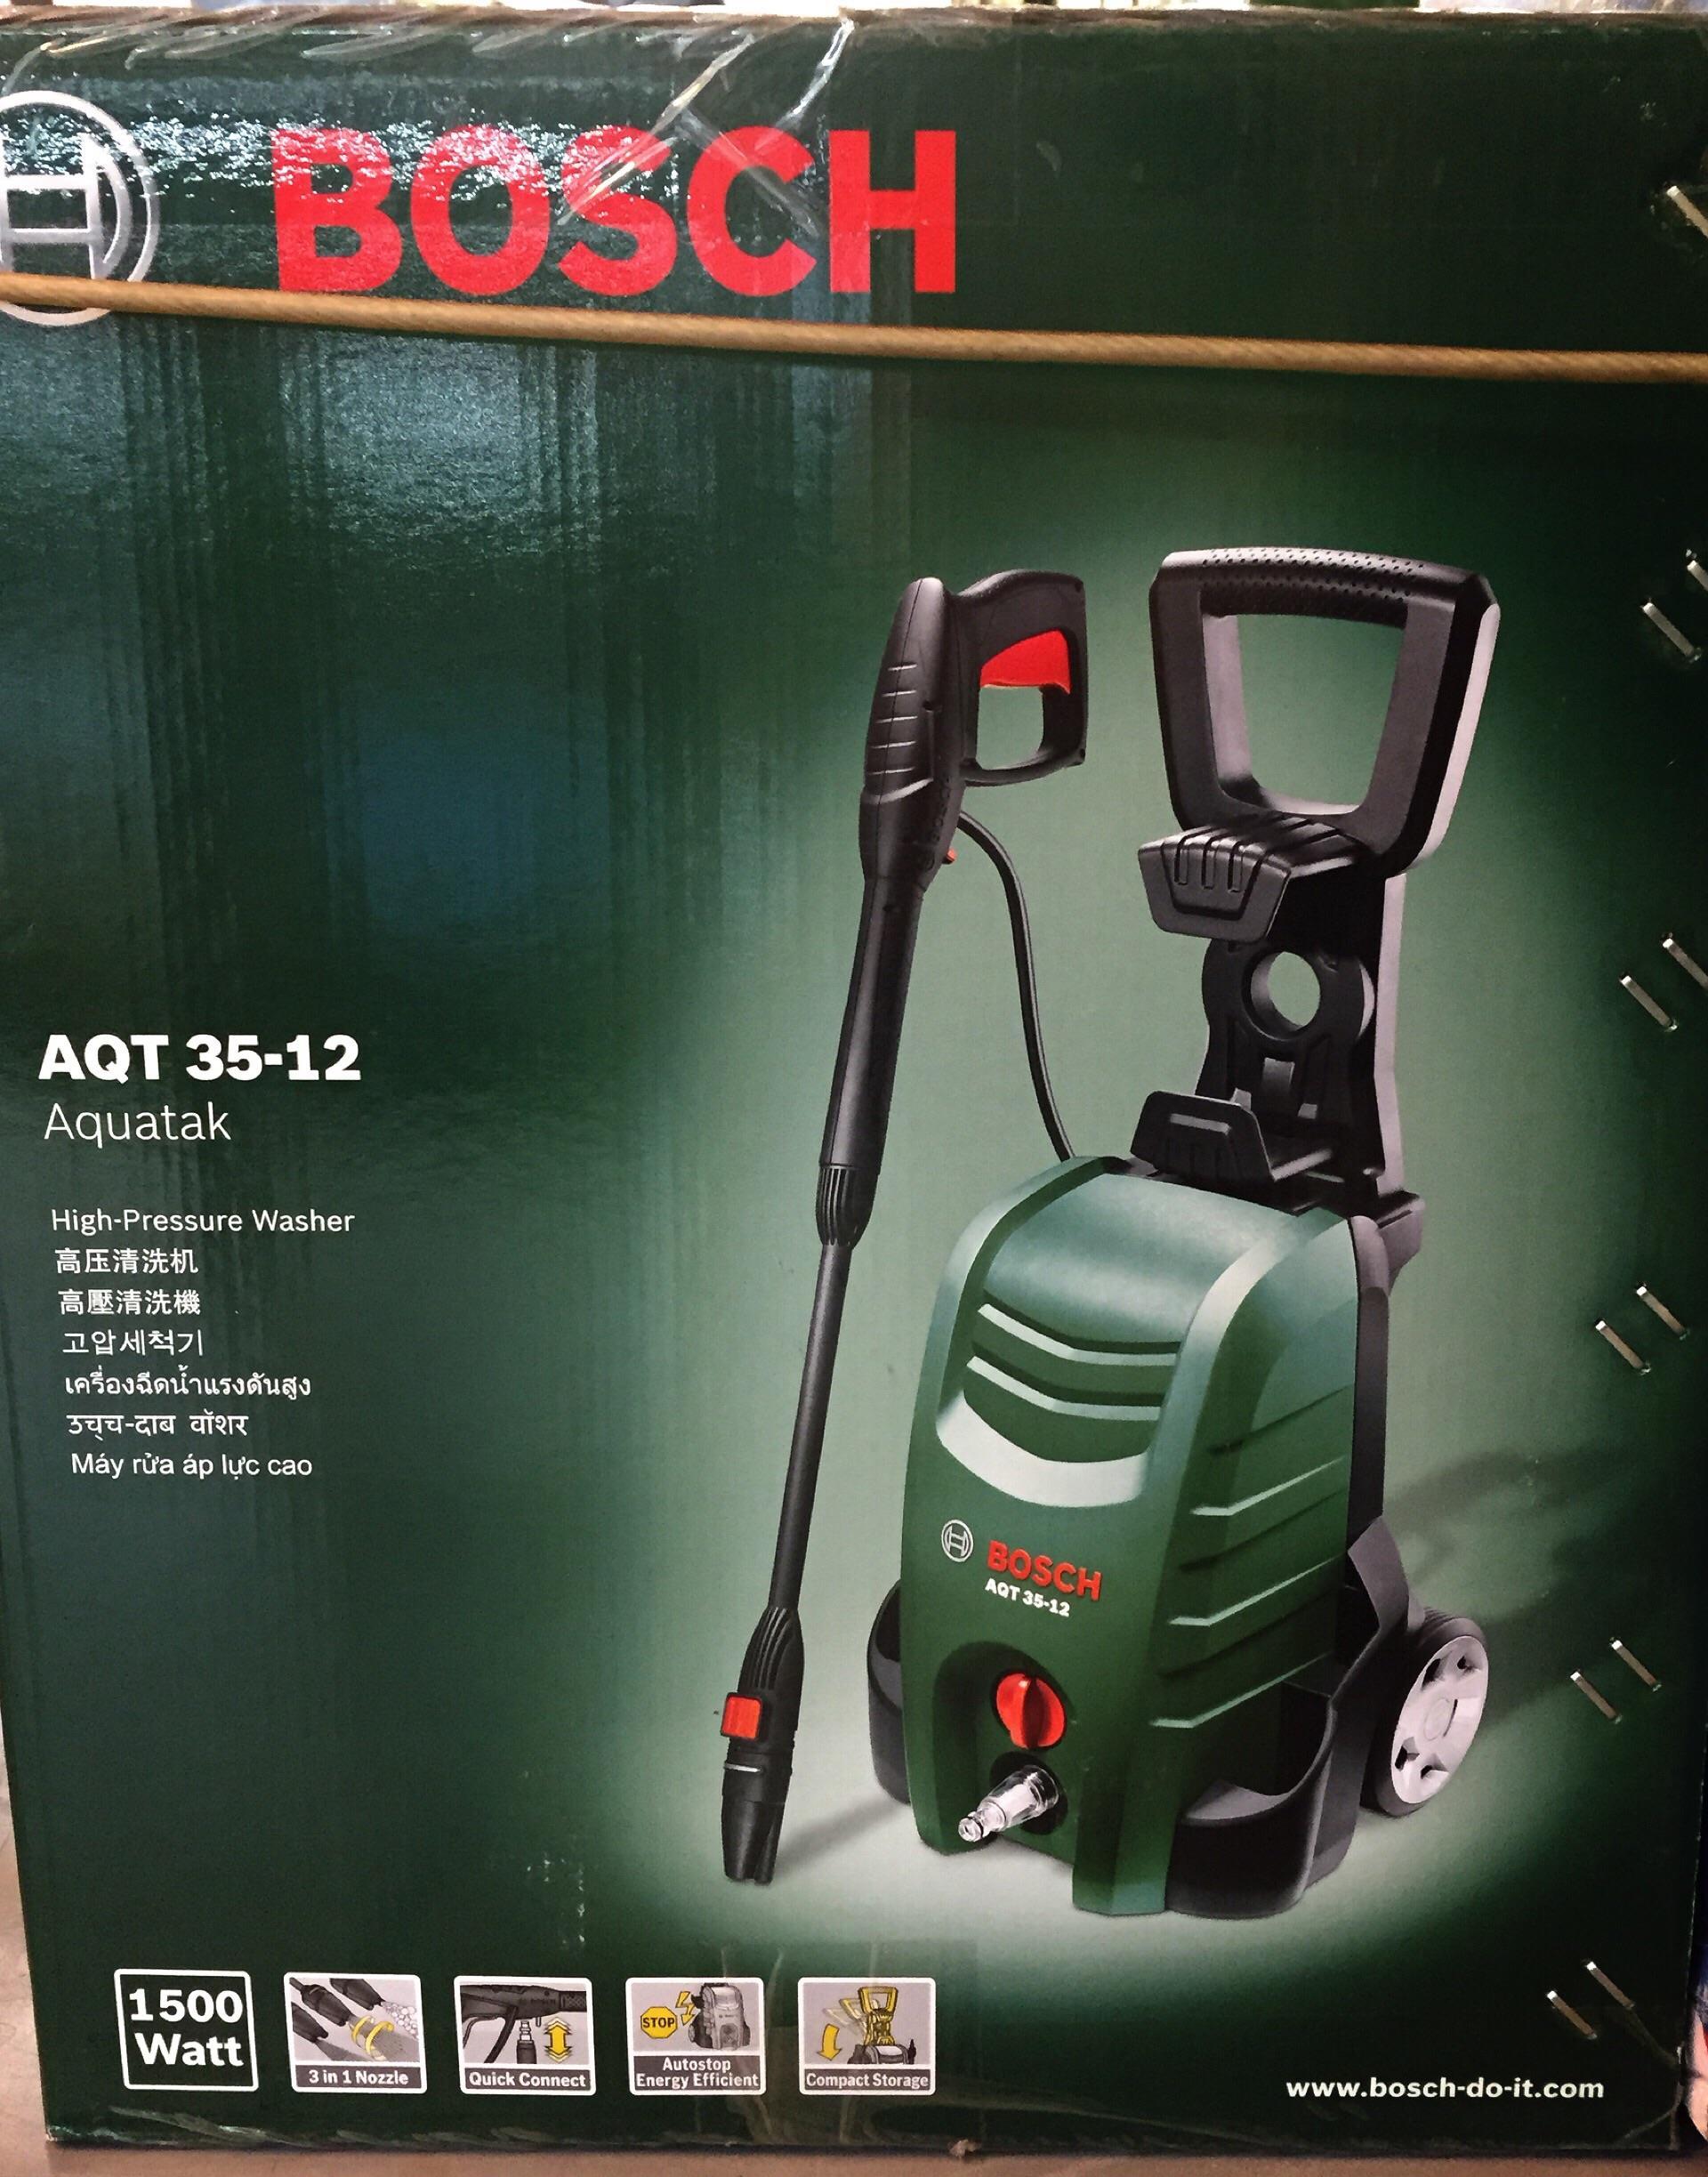 Bosch Pressure Washer Aqt 35 12 Alat Pembersih High Cleaner Listrik Ghp 5 14 Jual